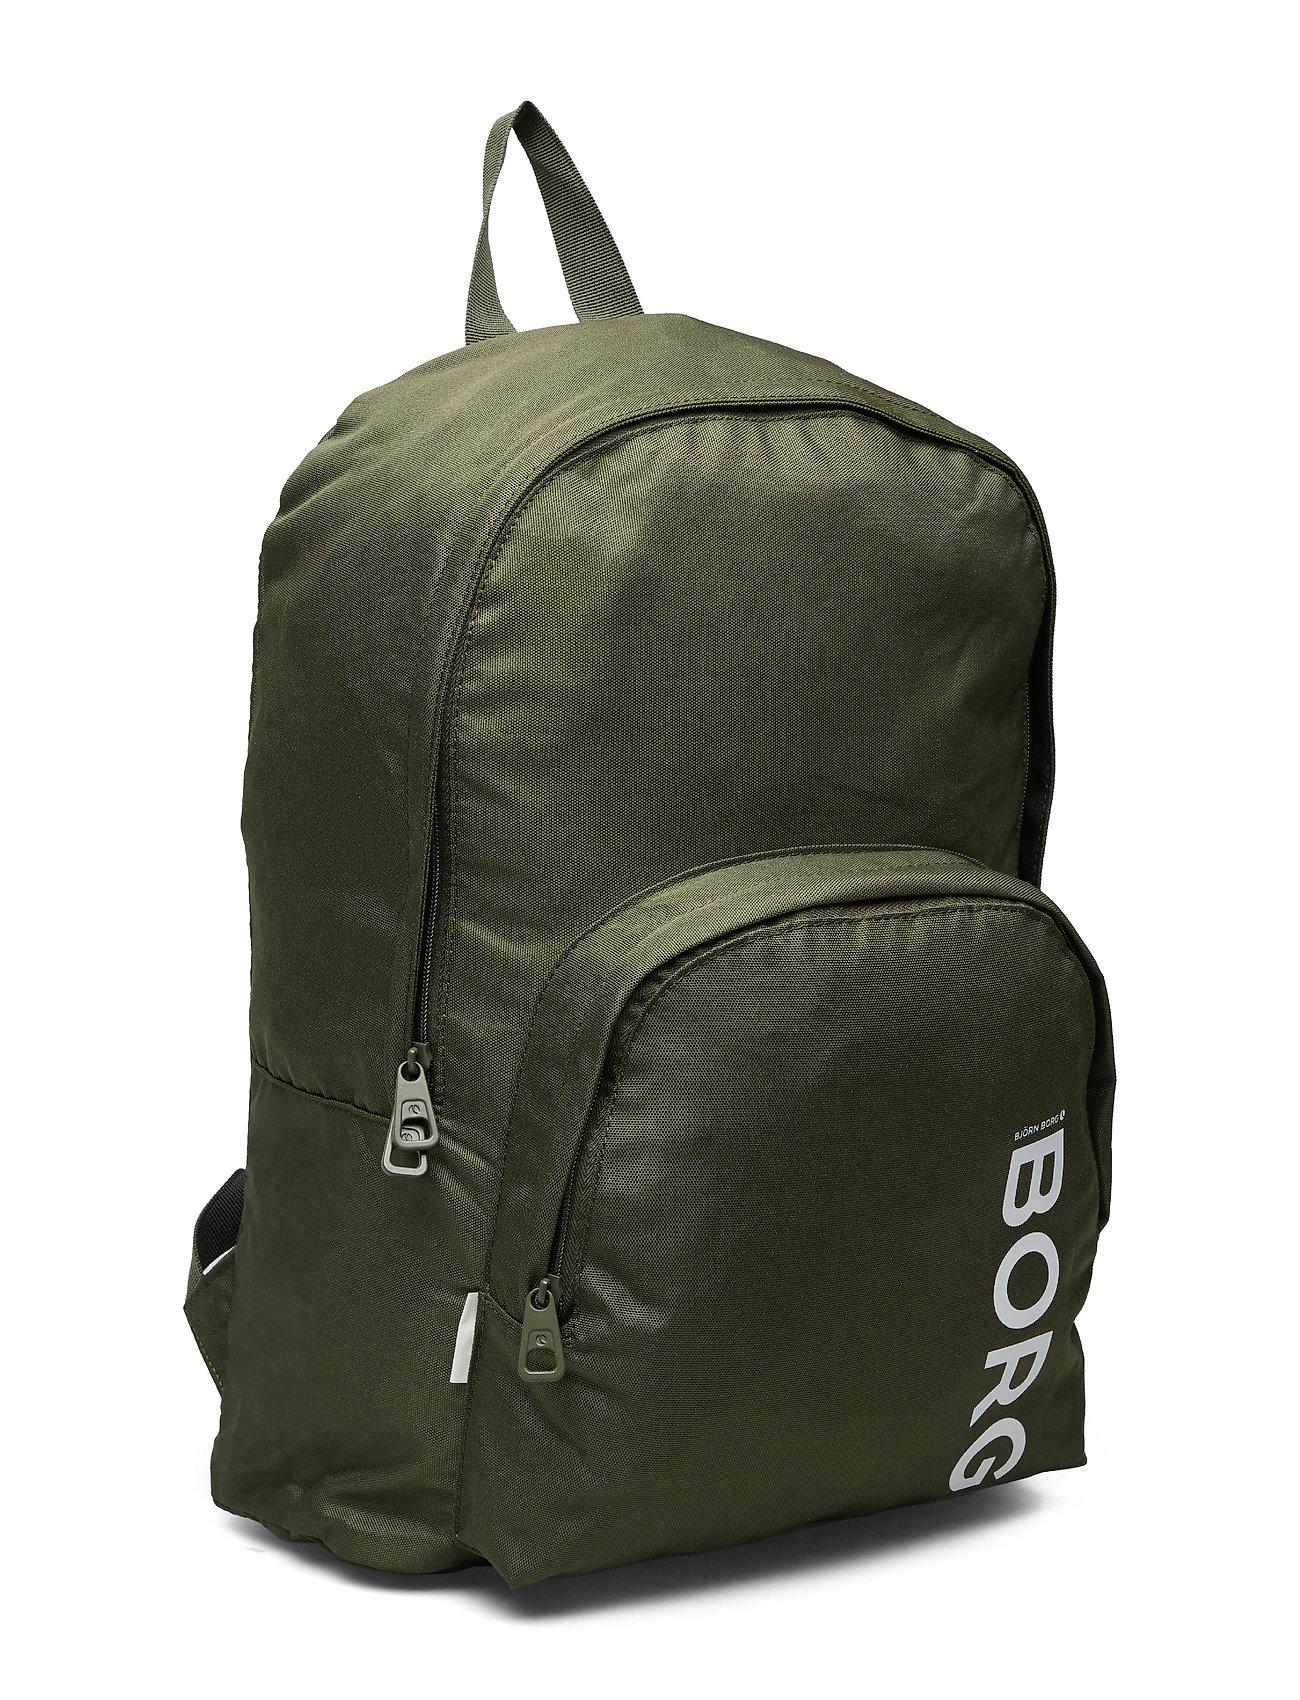 Bags Borg Borg Back Back PackgreenBjörn Back Bags PackgreenBjörn PackgreenBjörn hQtxsrBdC